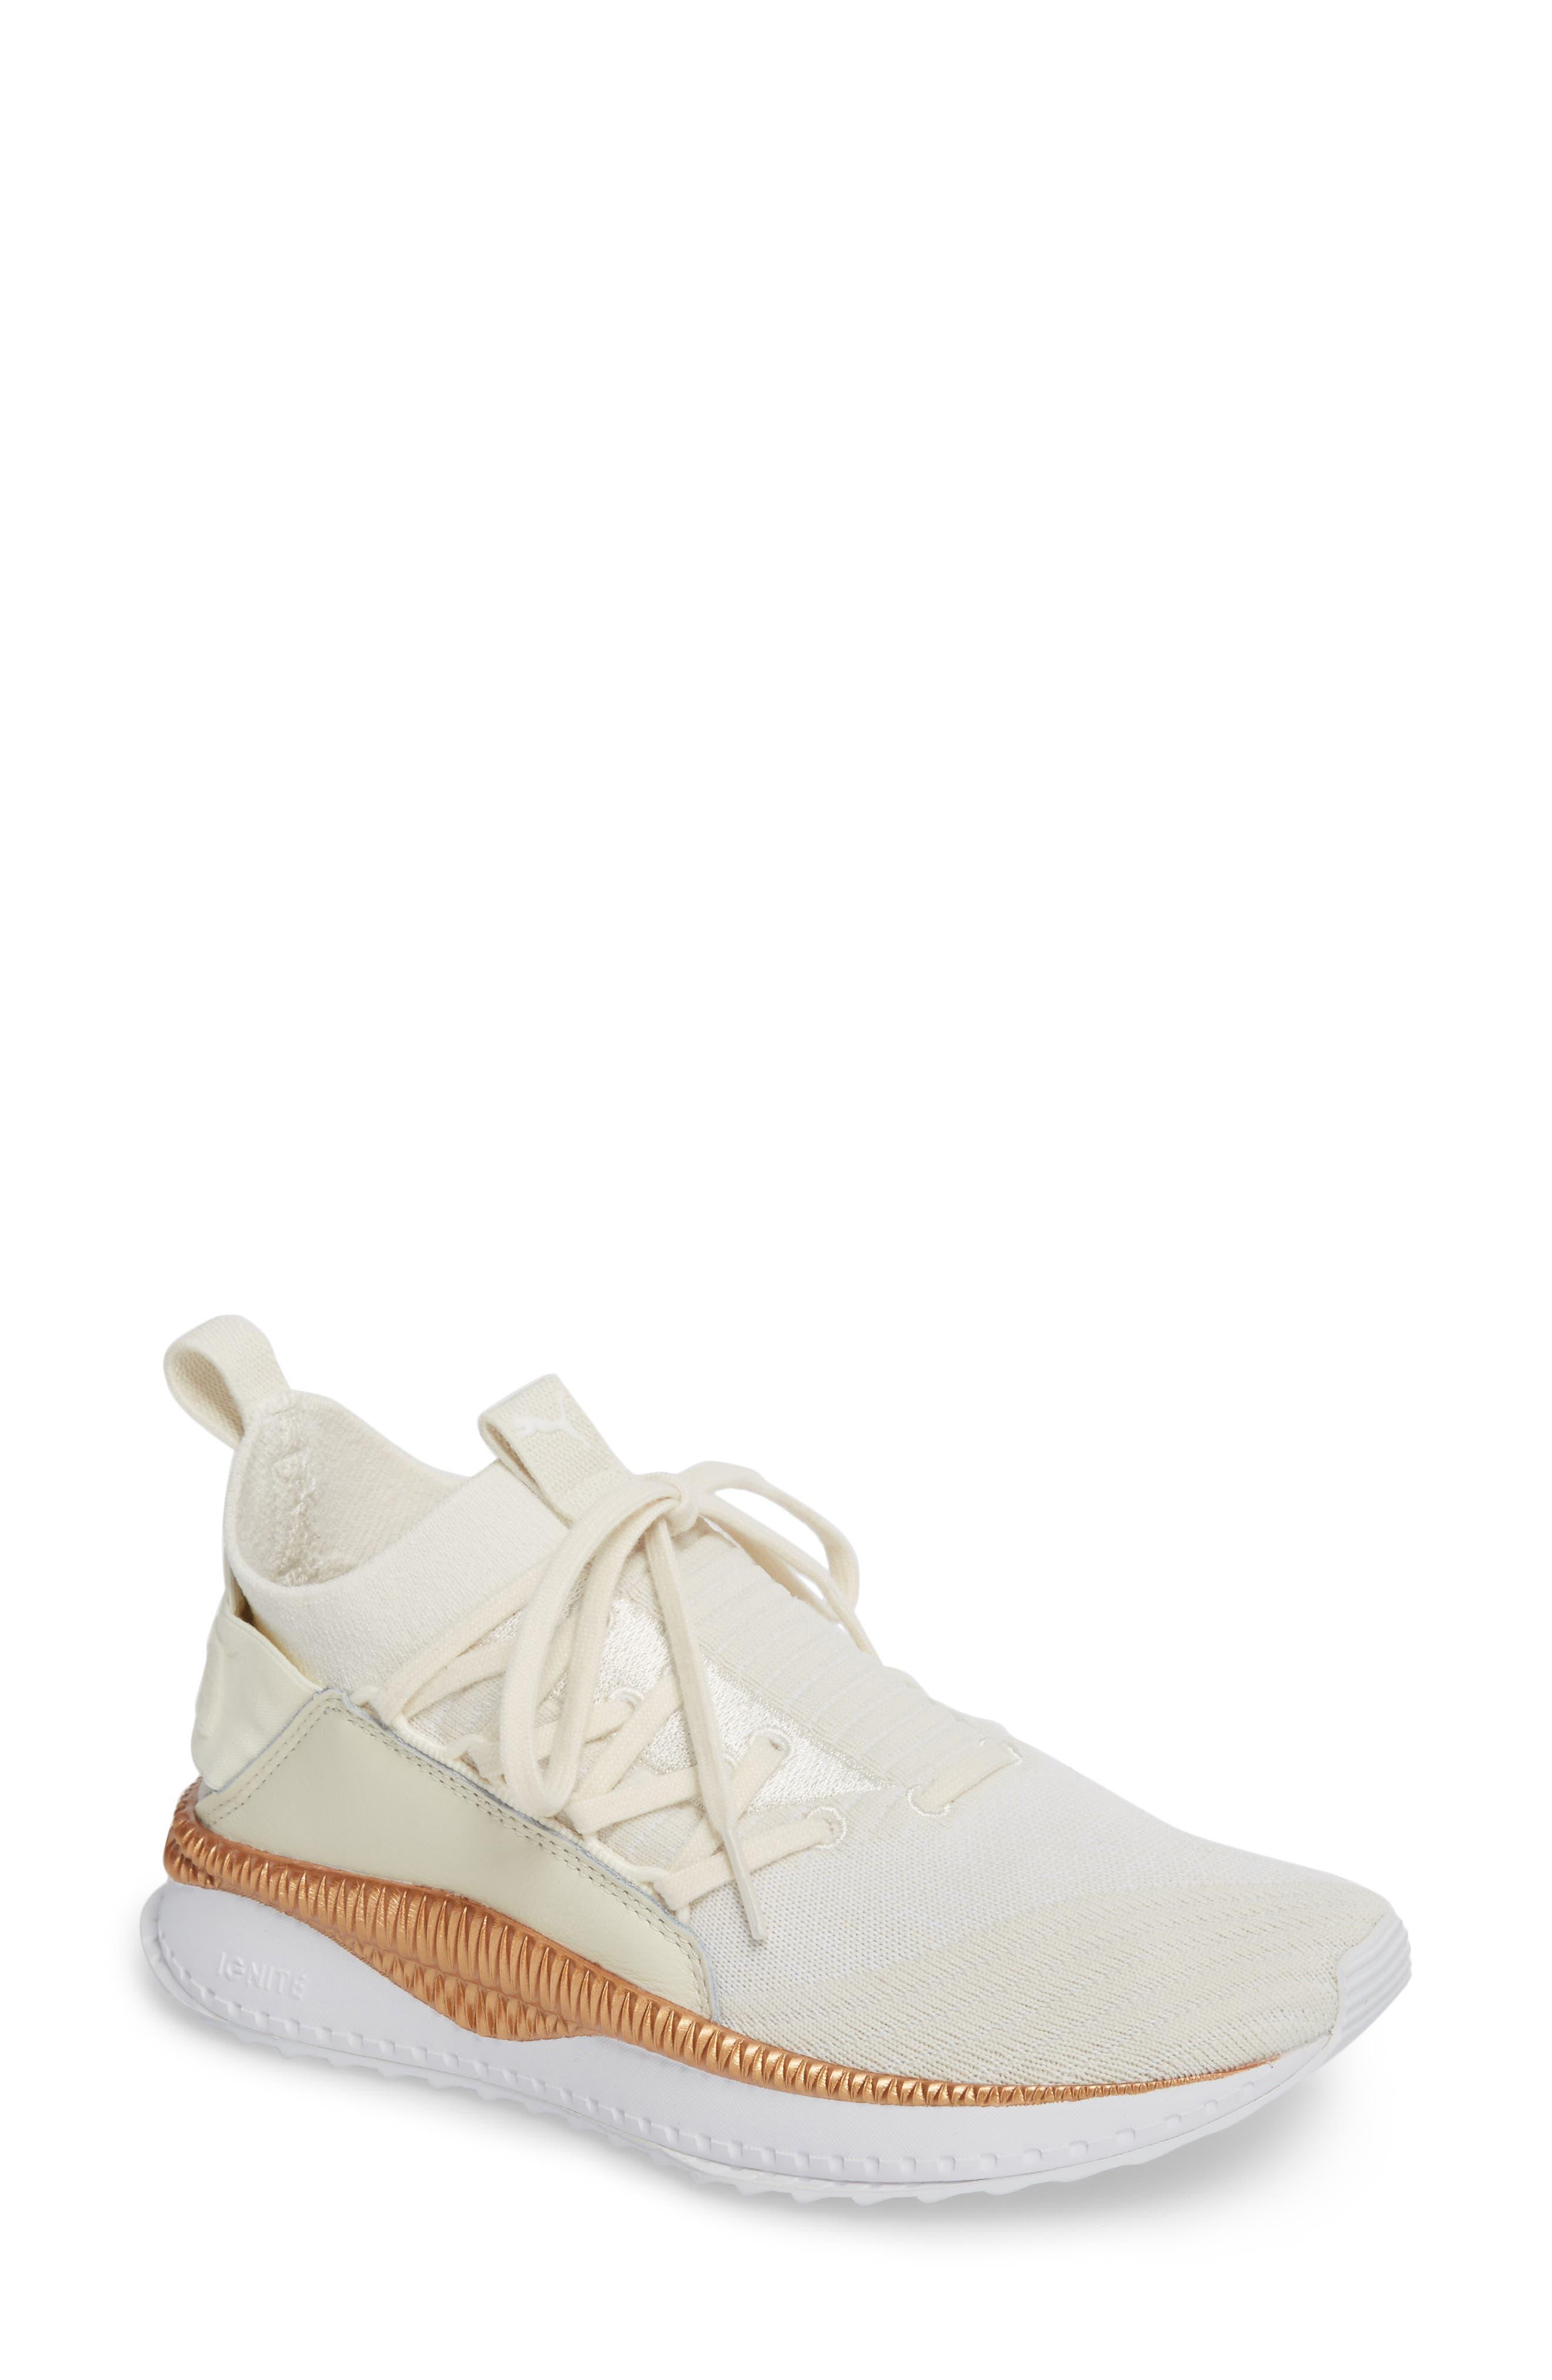 Tsugi Jun Knit Sneaker,                             Main thumbnail 5, color,